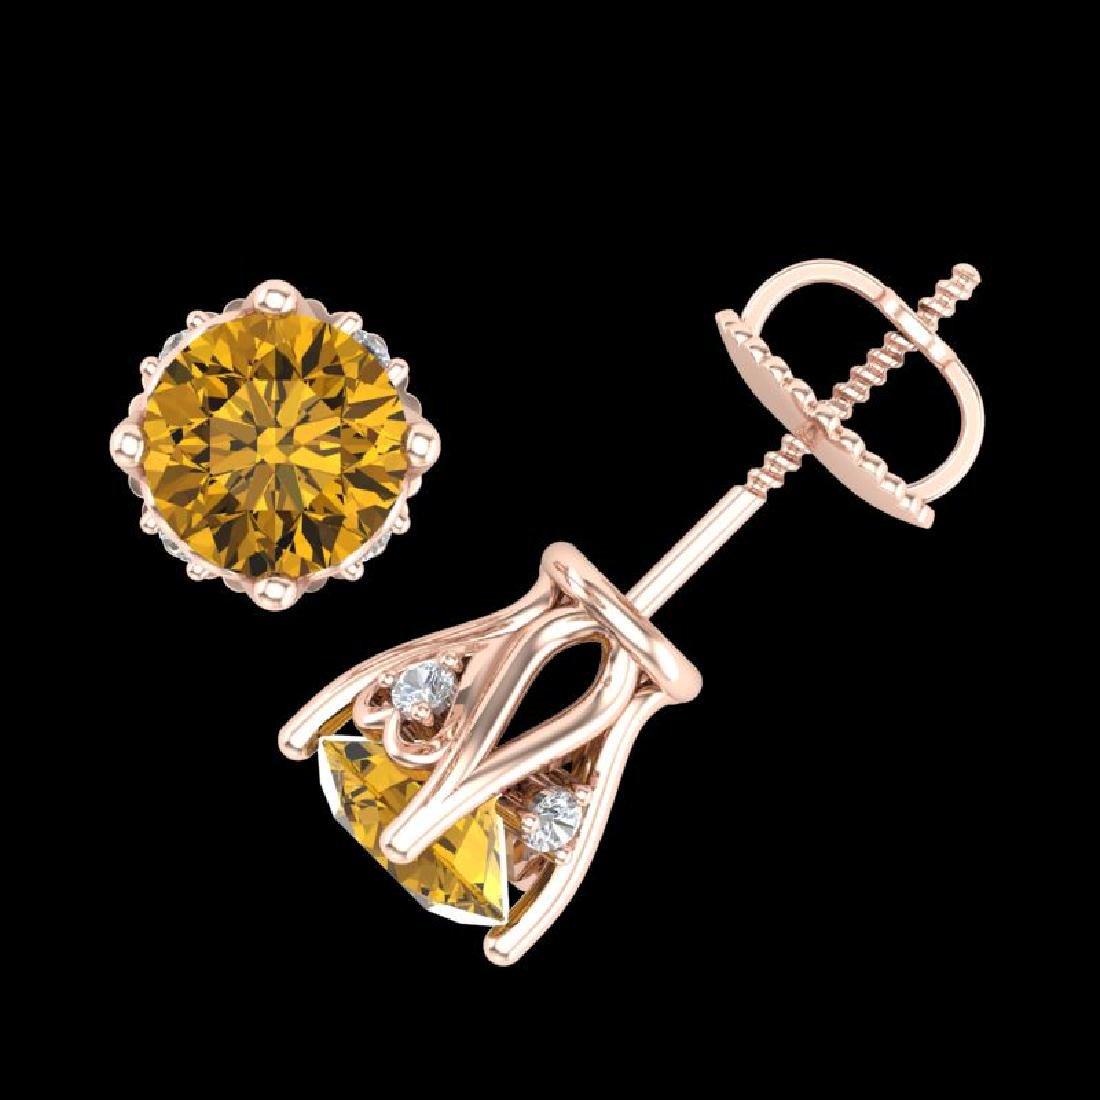 1.26 CTW Intense Fancy Yellow Diamond Art Deco Stud - 3